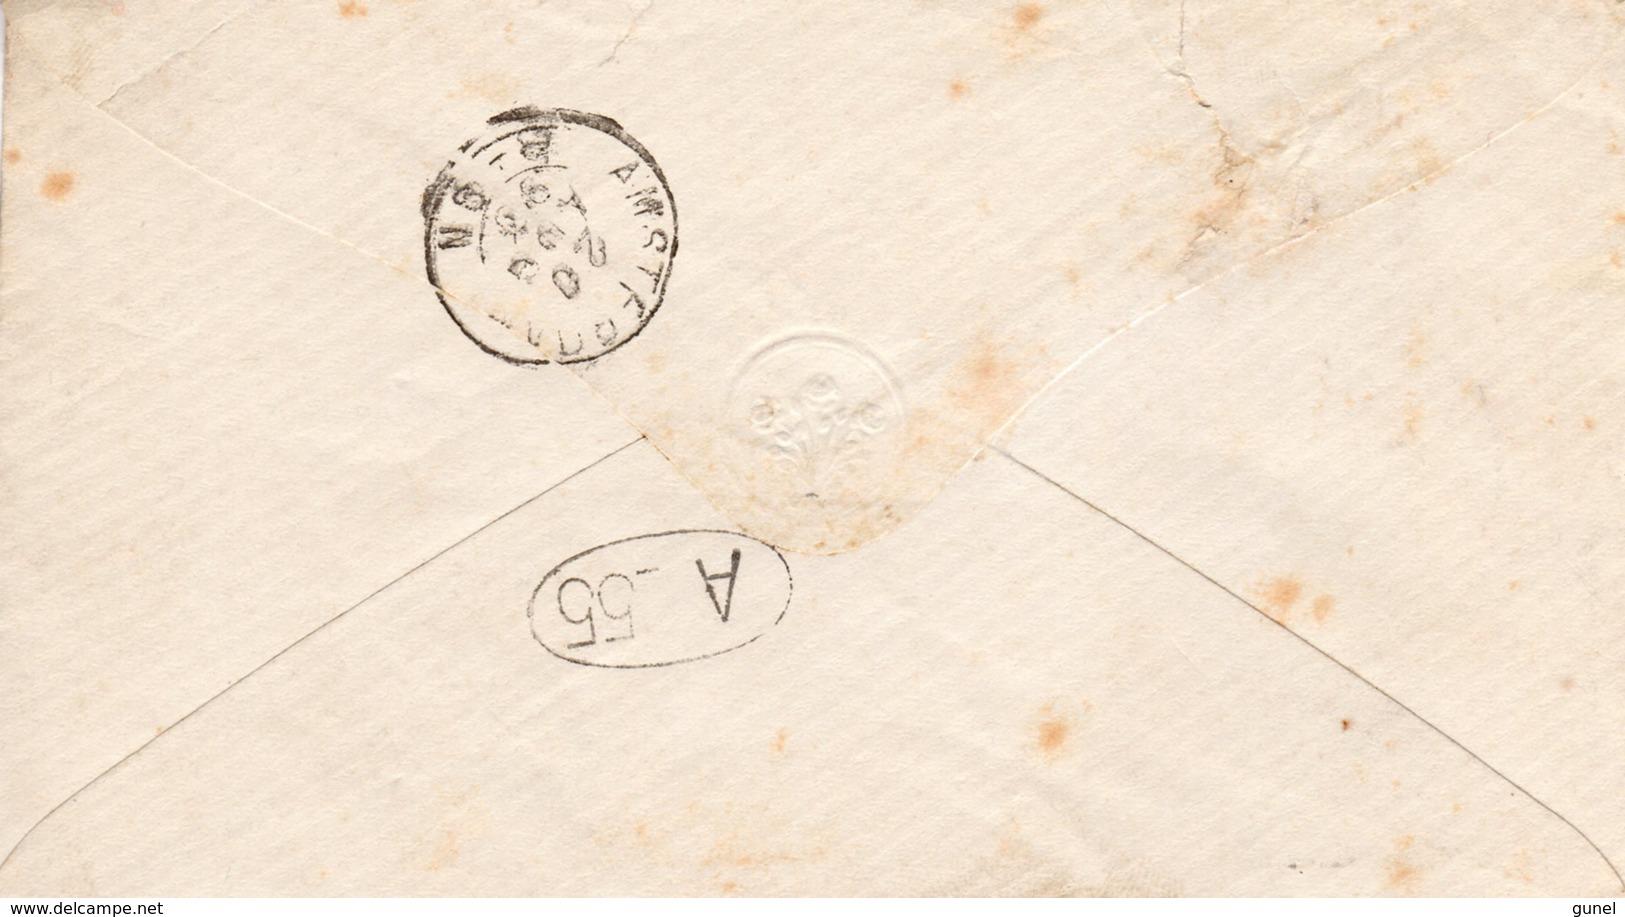 20 AUG 93 Envelopje Lokaal Te Amsterdam Met NVPH 34 Met Kl. Rond - Periode 1891-1948 (Wilhelmina)